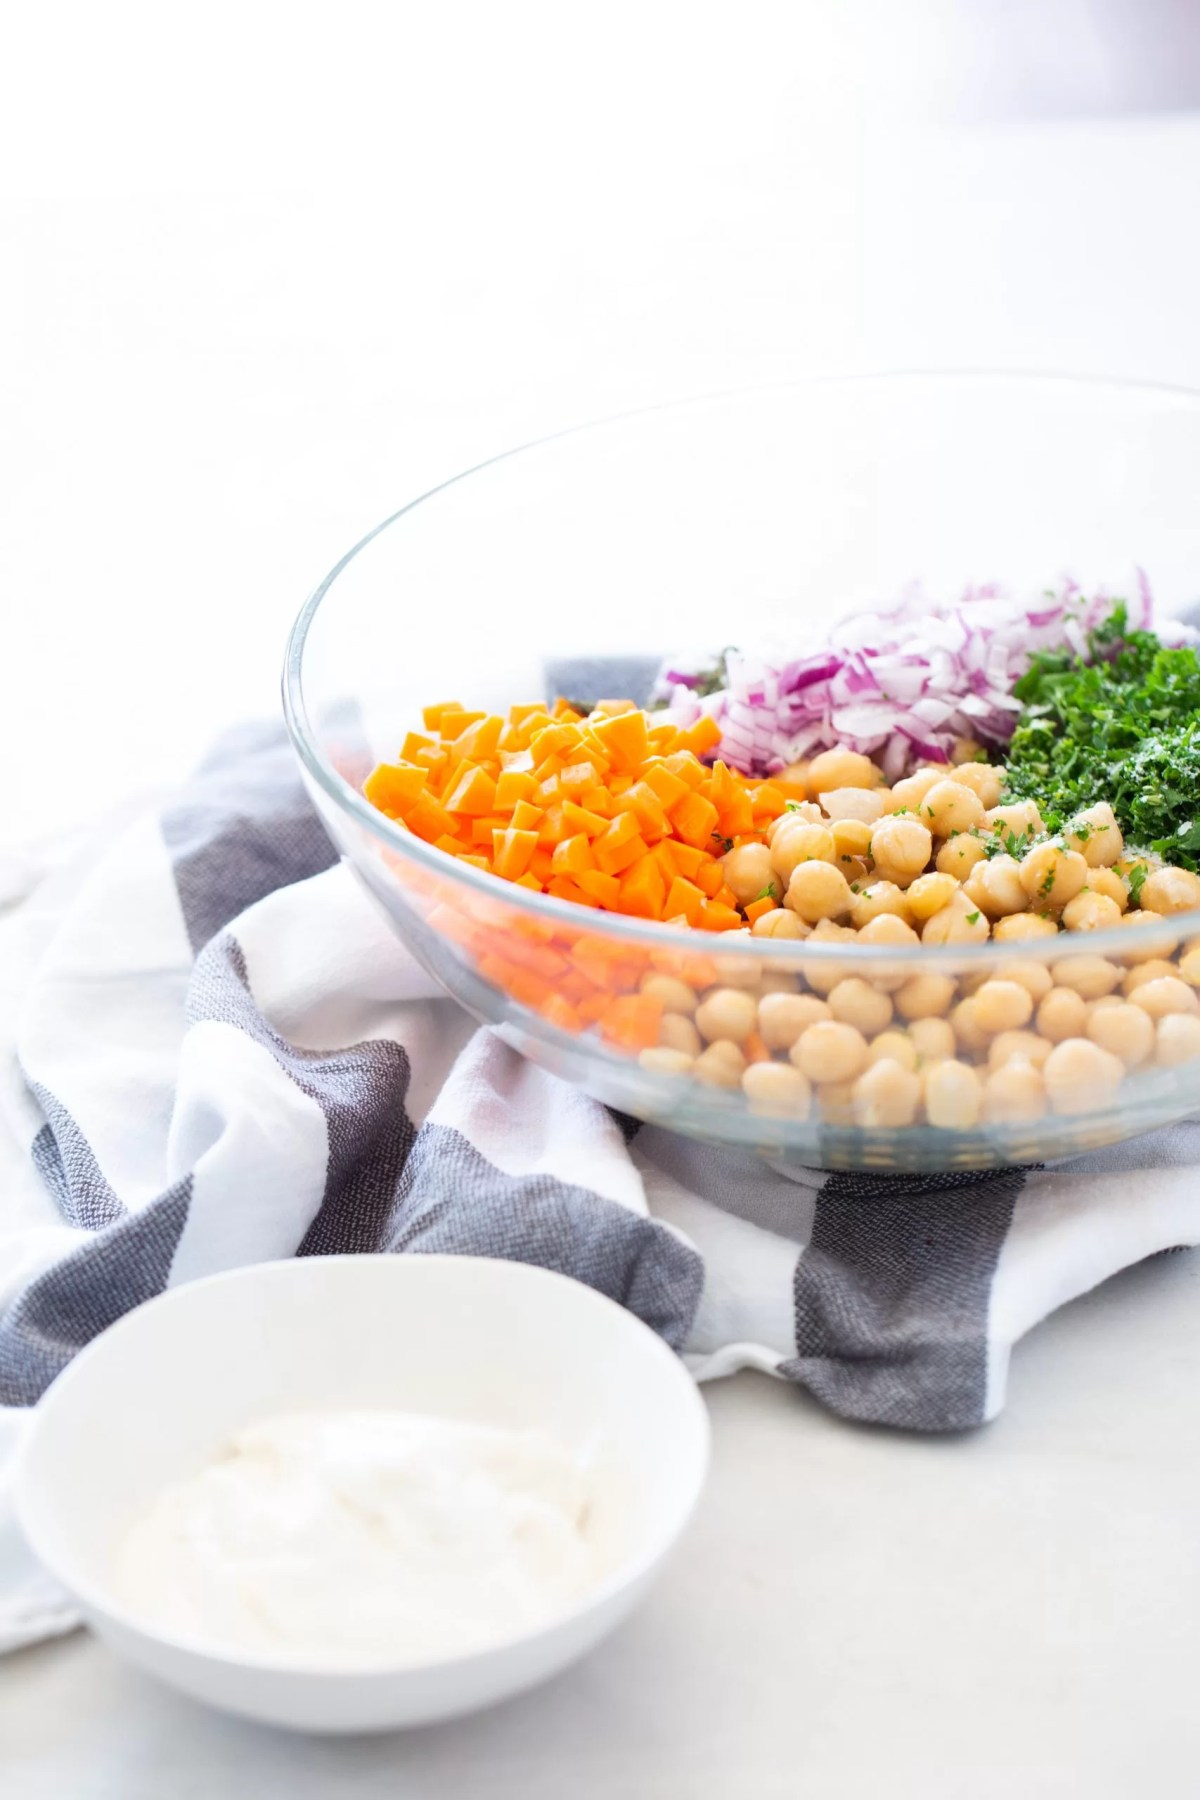 Ingredients to mix to make a vegan chickpea salad